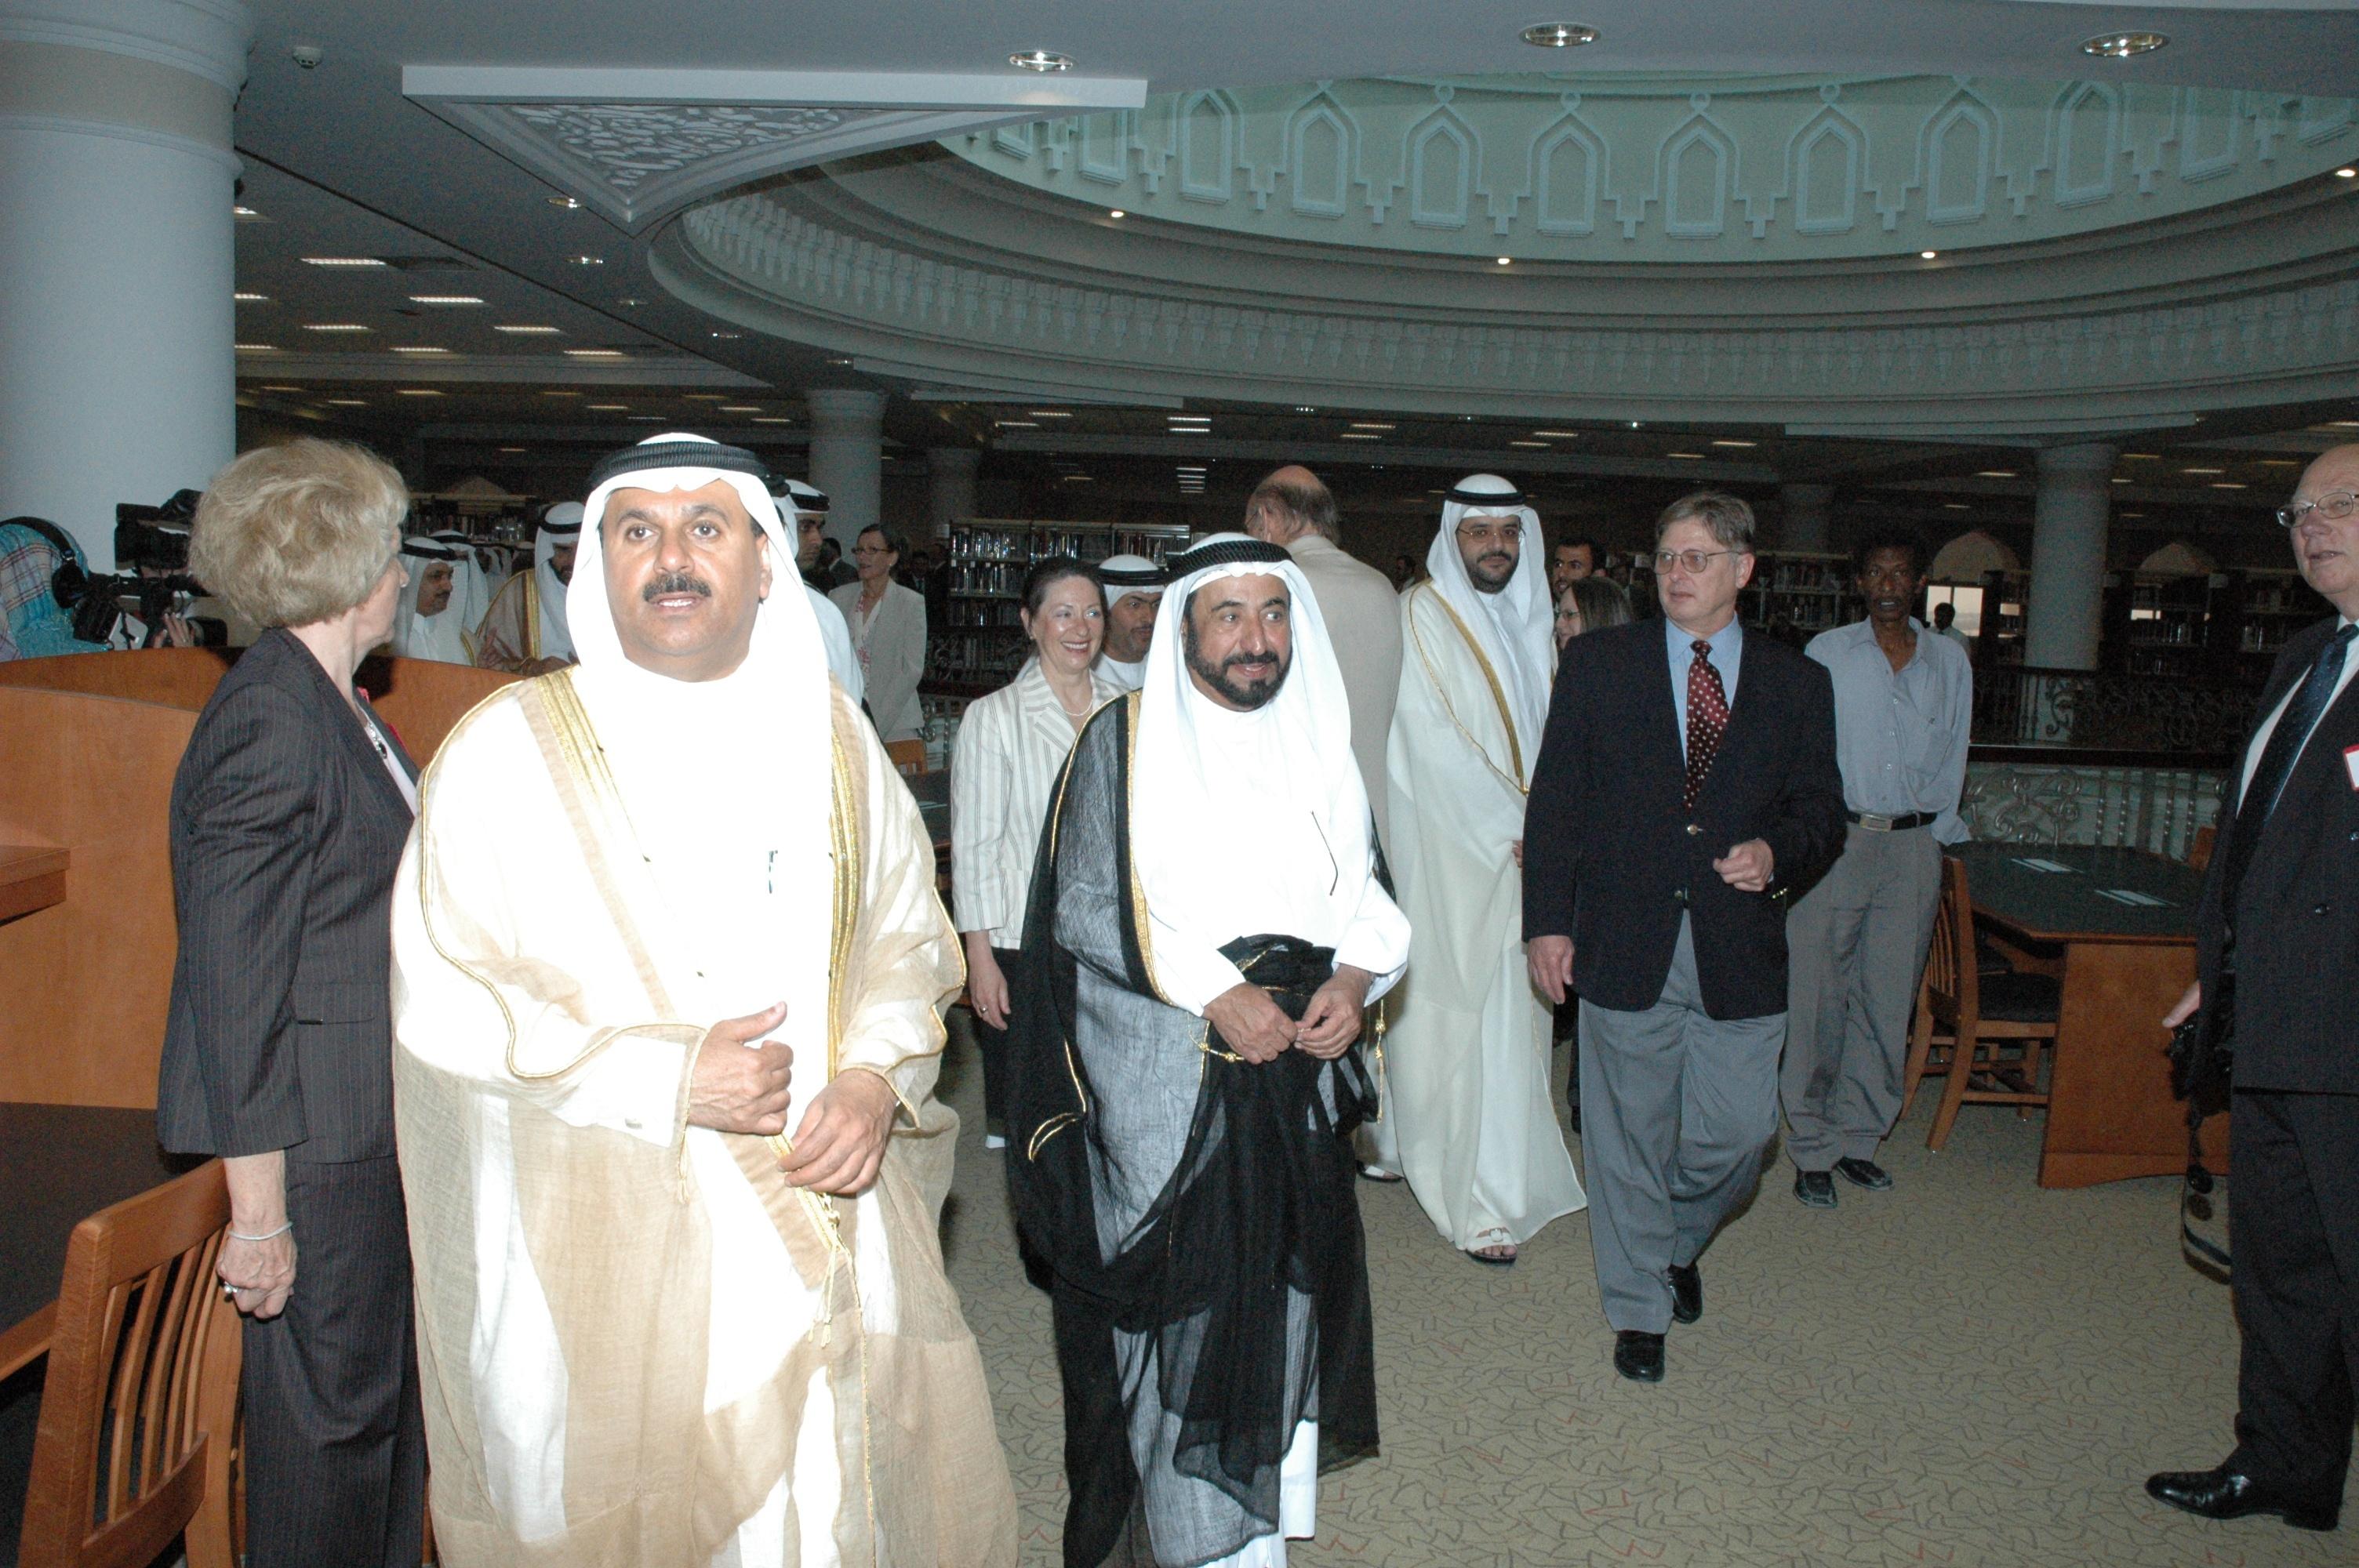 American_University_of_Sharjah_Library_7.jpg